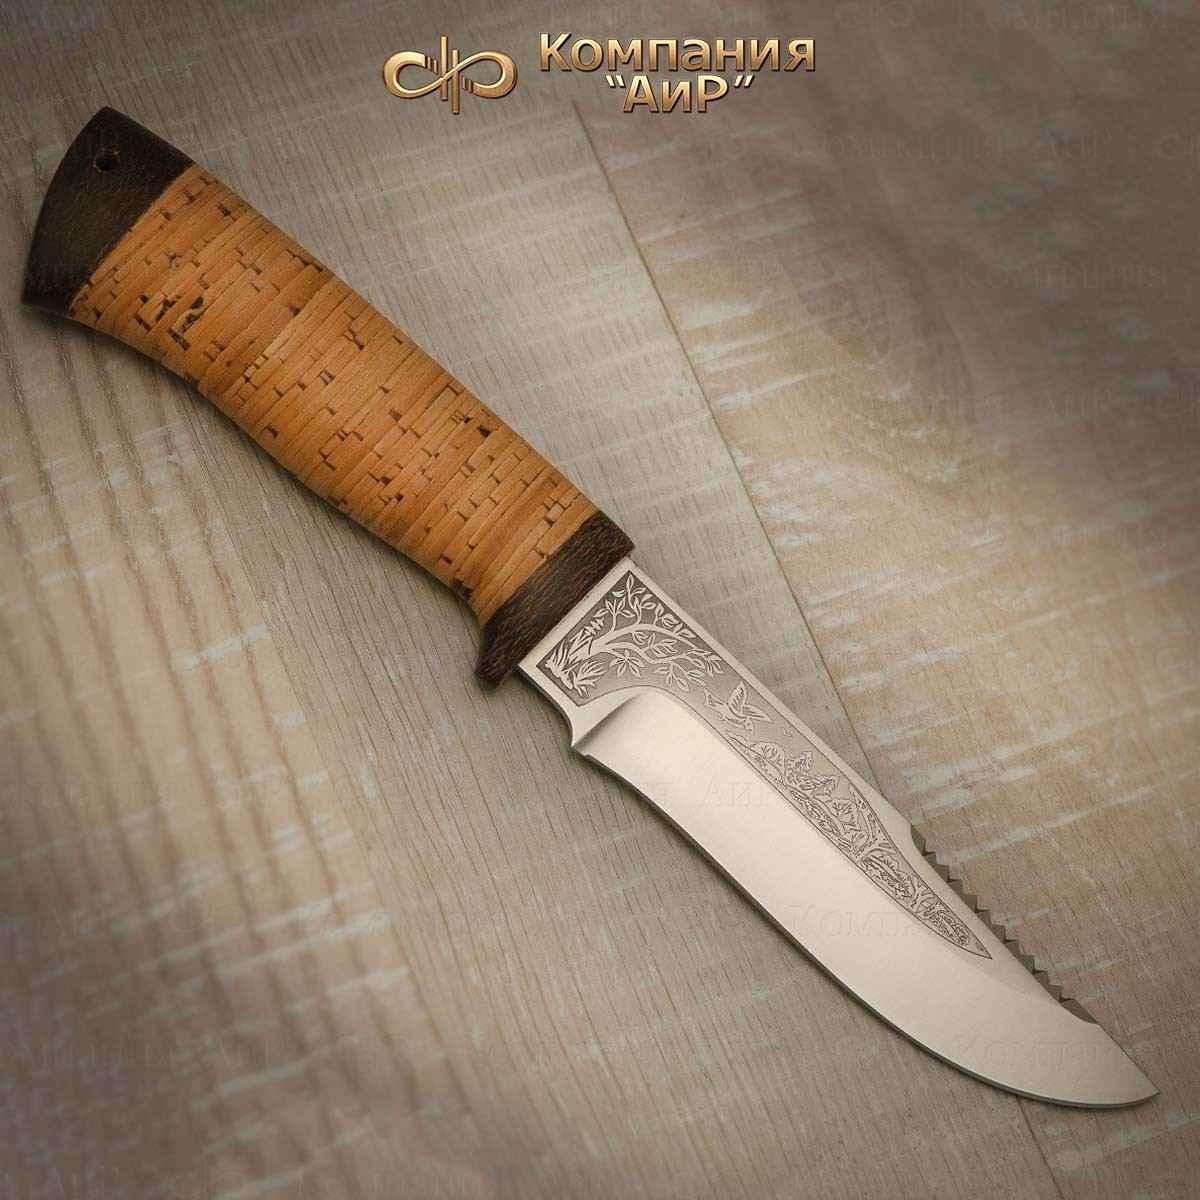 Нож АиР Стрелец, сталь Elmax, рукоять береста